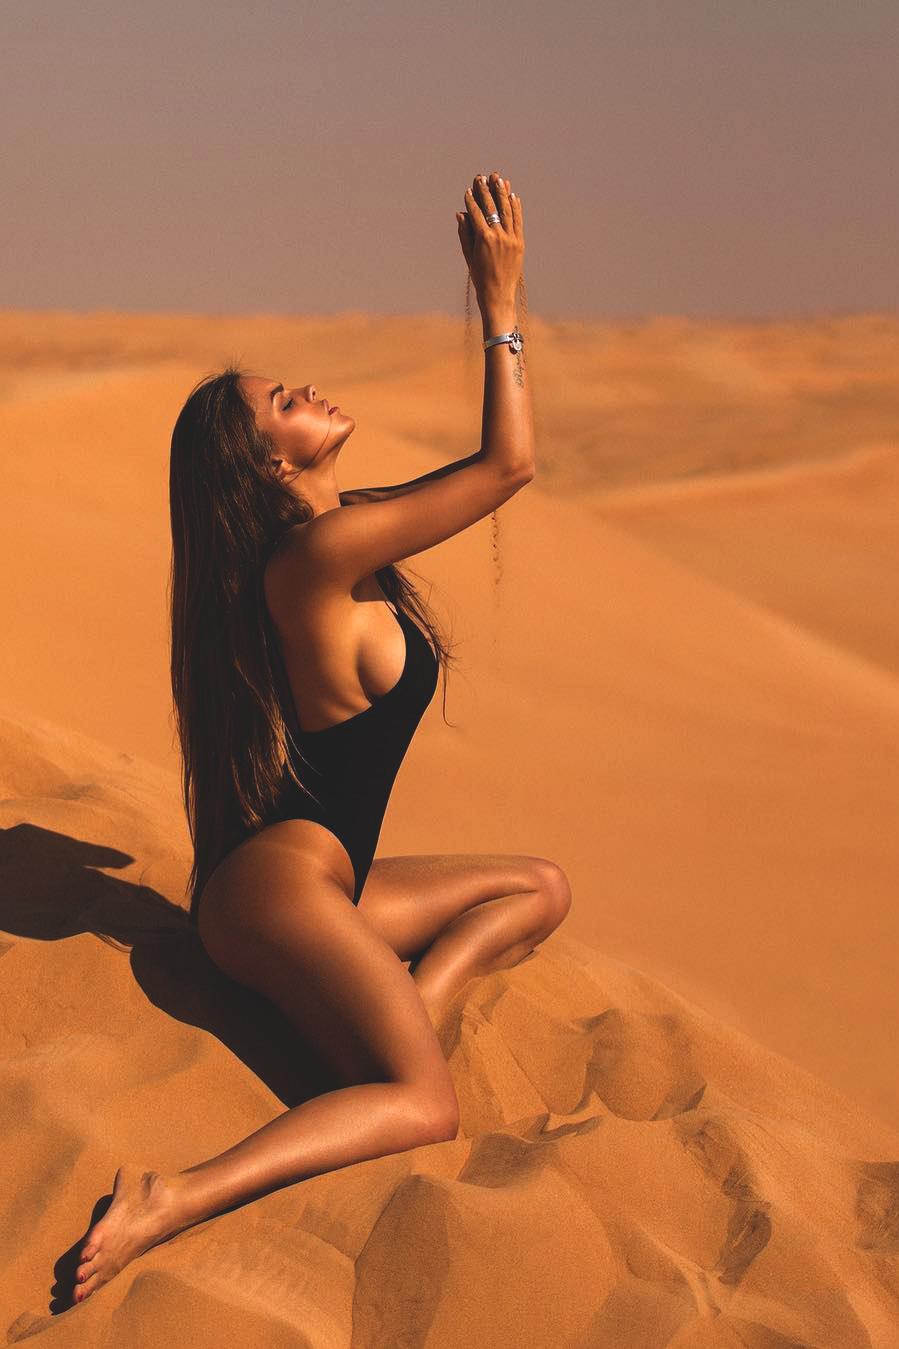 viki odintcova girl sand beach sunset nude woman sun travel fair weather sexy